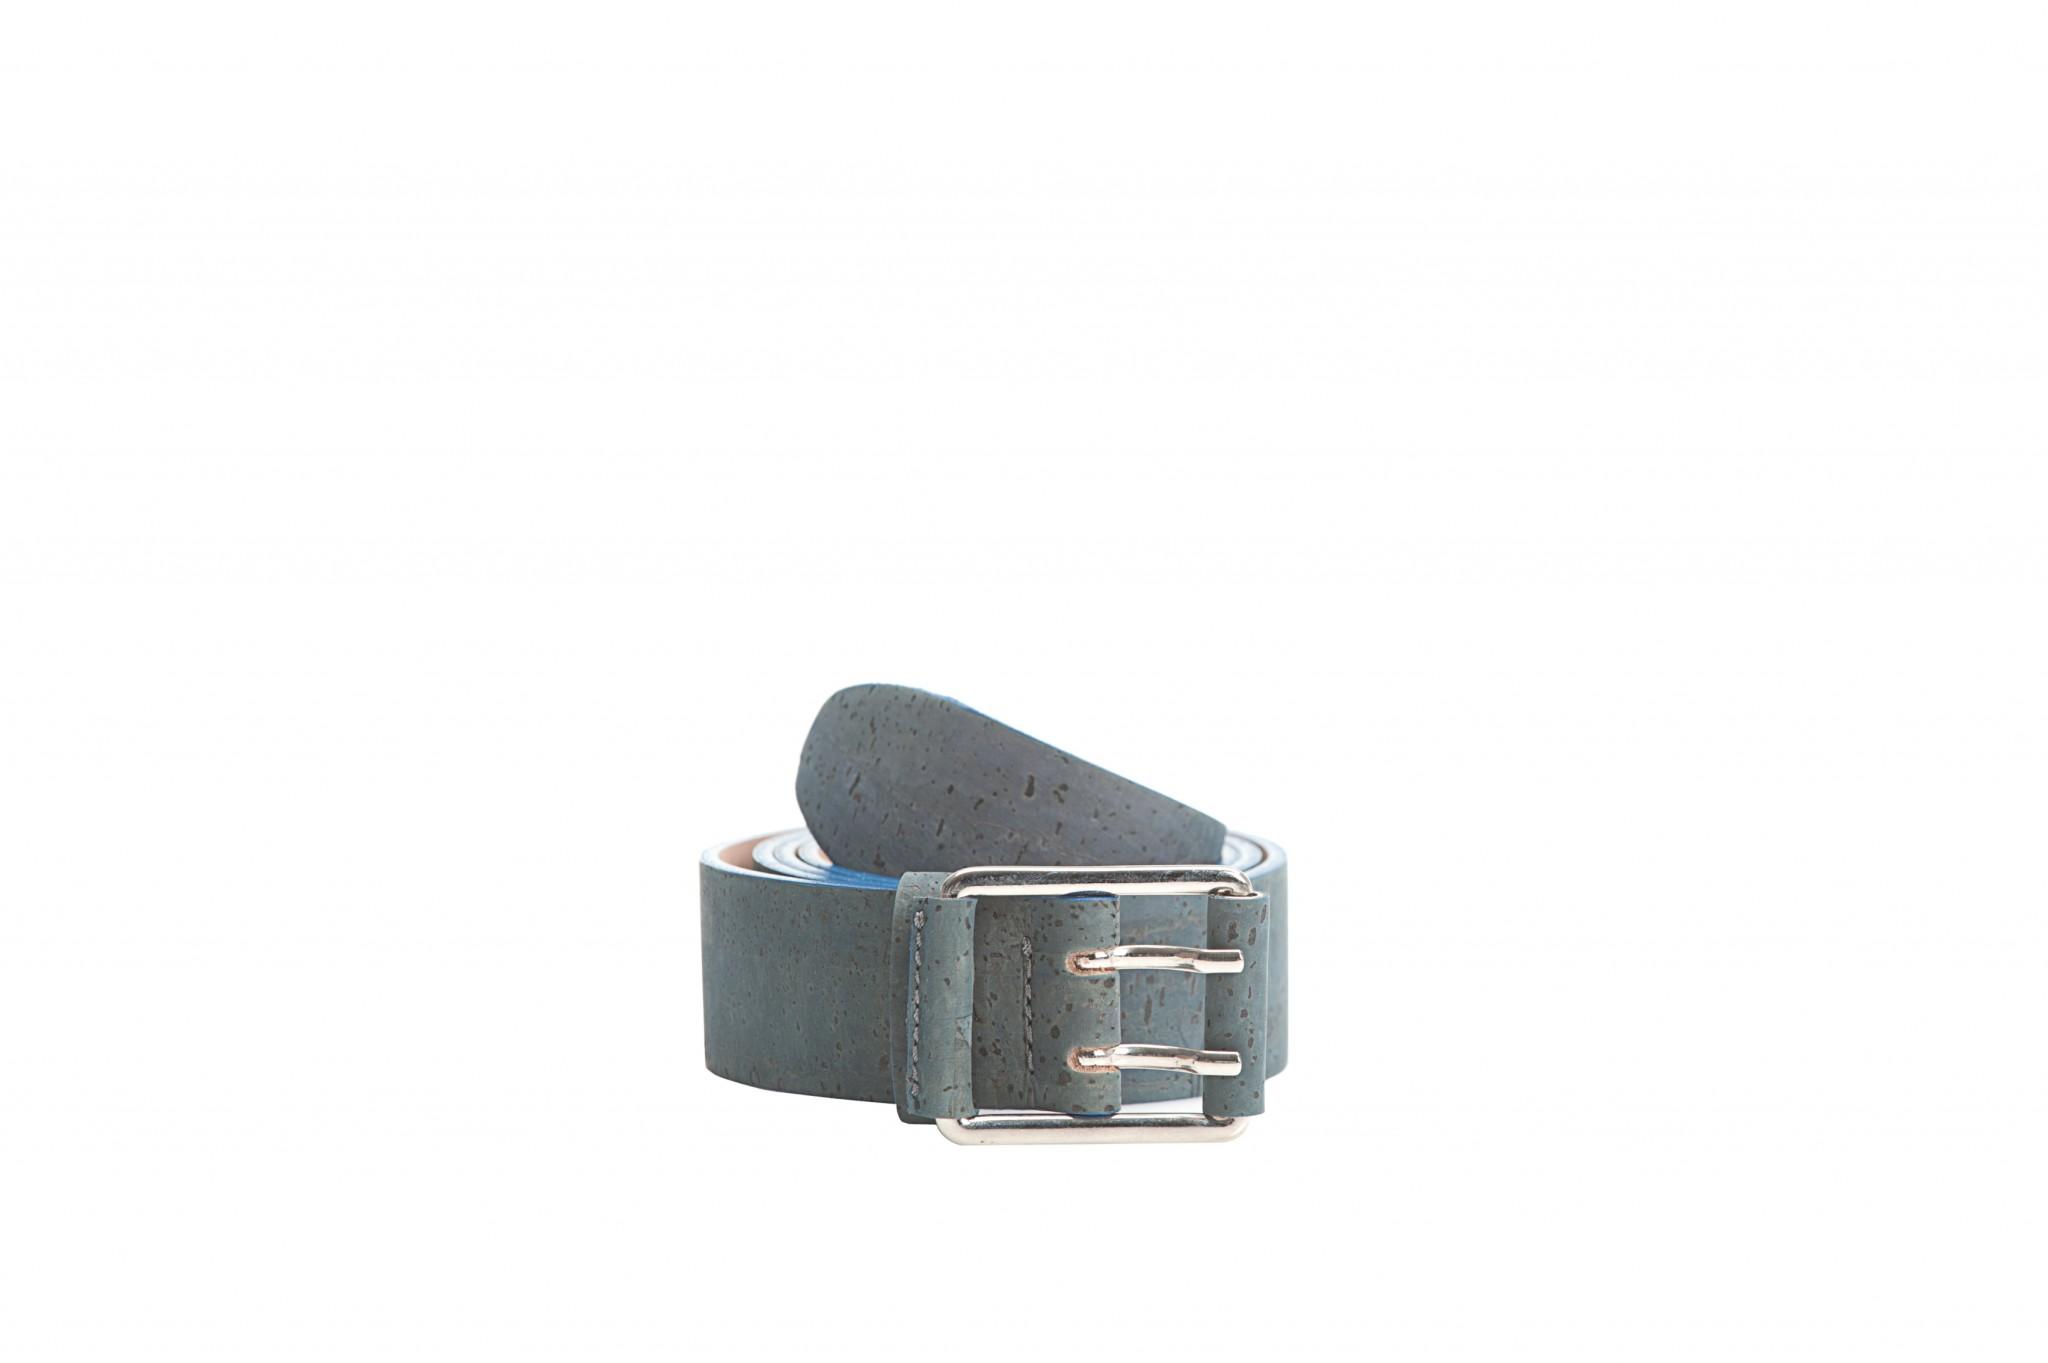 PELCOR GIF-61 Belt